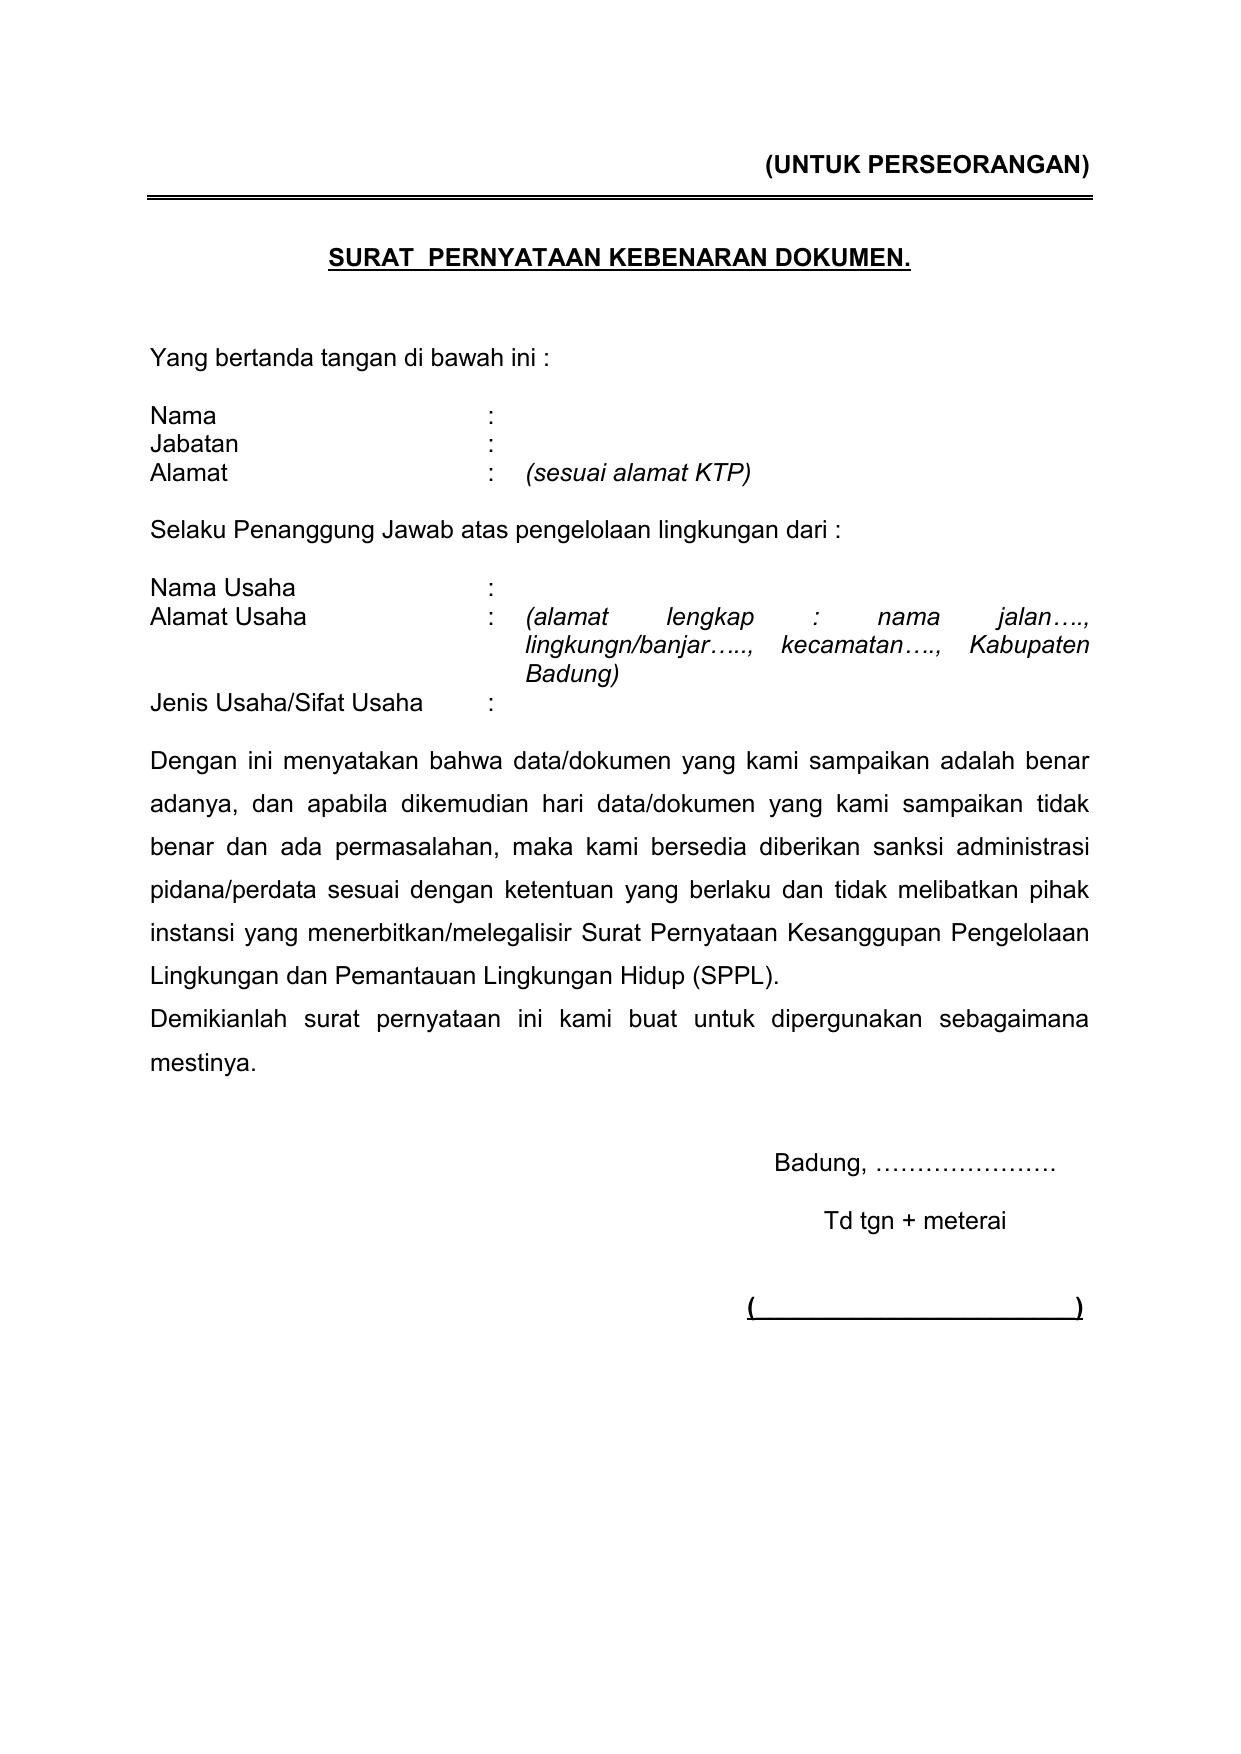 Surat Pernyataan Pengelolaan Lingkungan Sppl